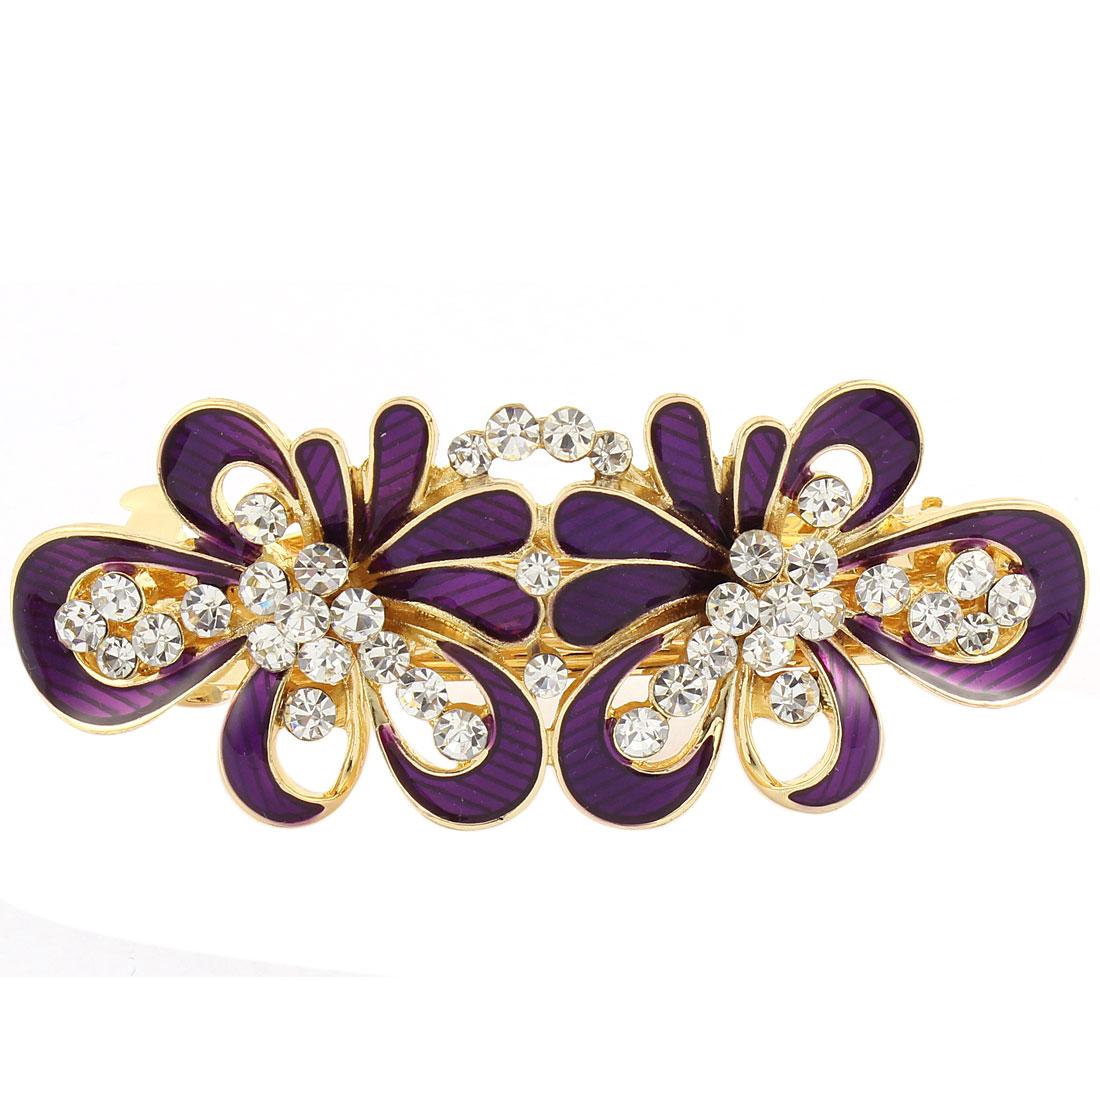 Women Floral Shape Rhinestone Detail Spring Loaded Hair Barrette Clip Purple